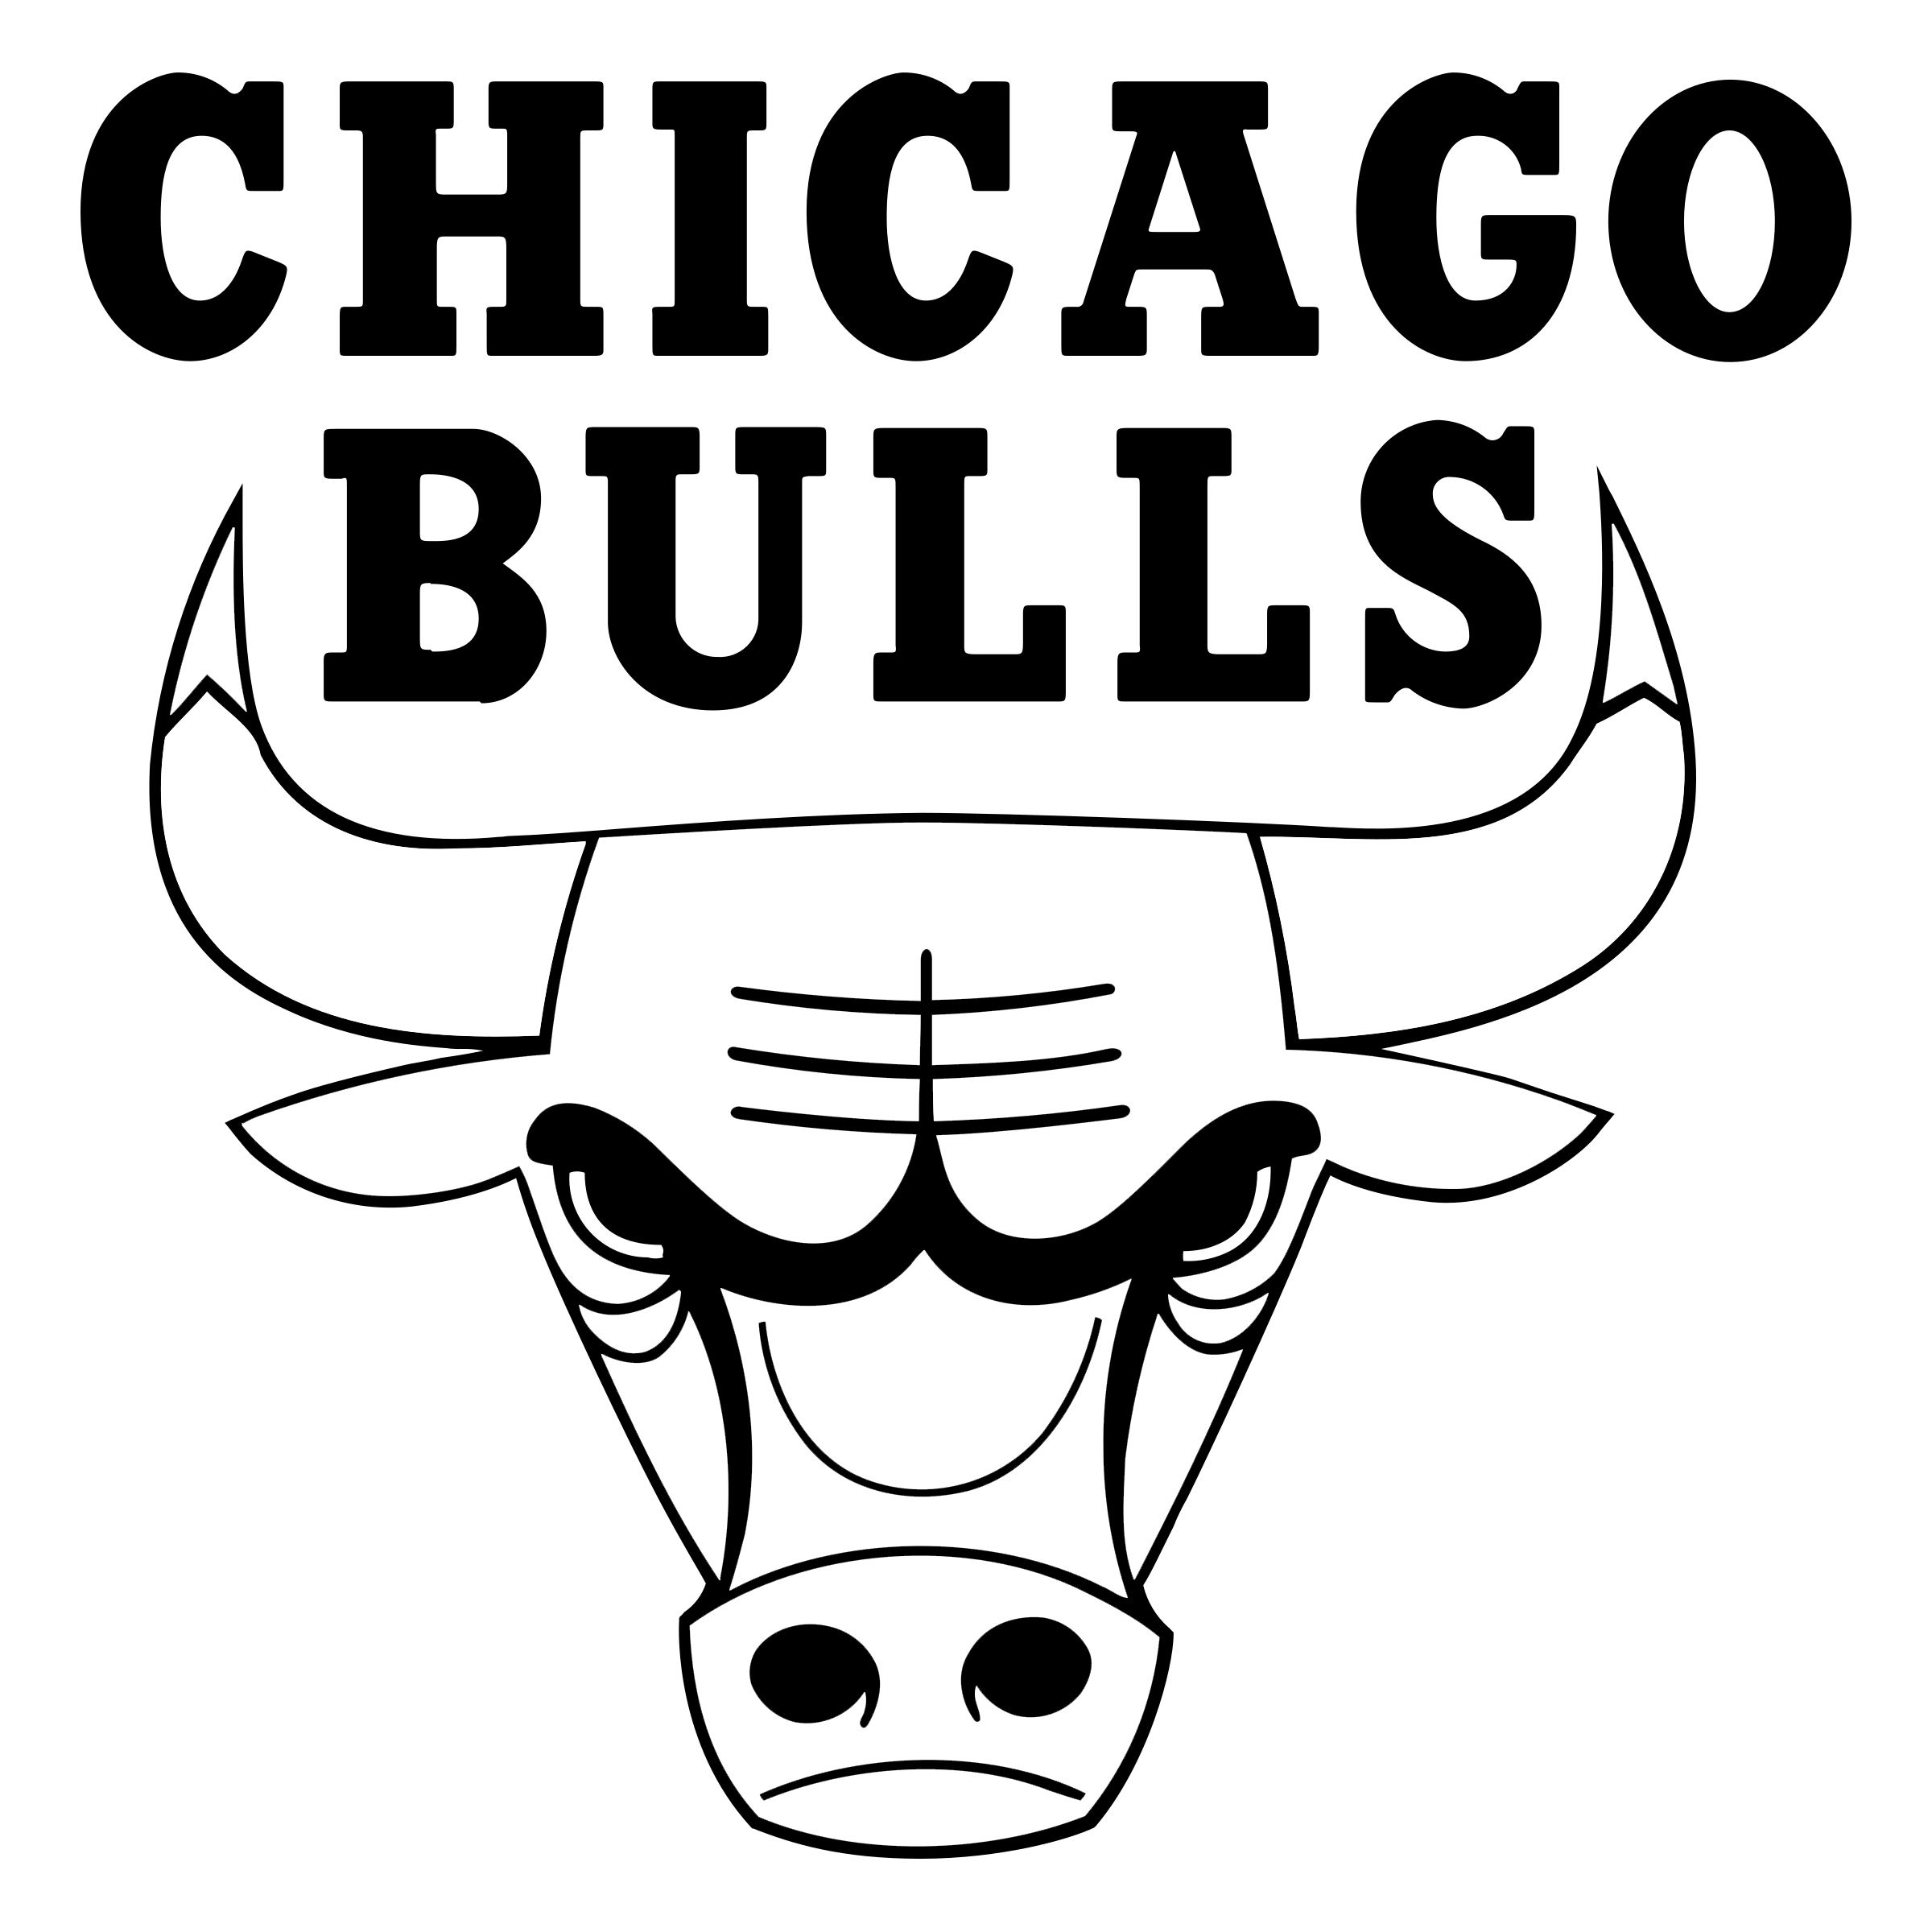 2400x2400 Chicago Bulls Logo Png Transparent Amp Svg Vector